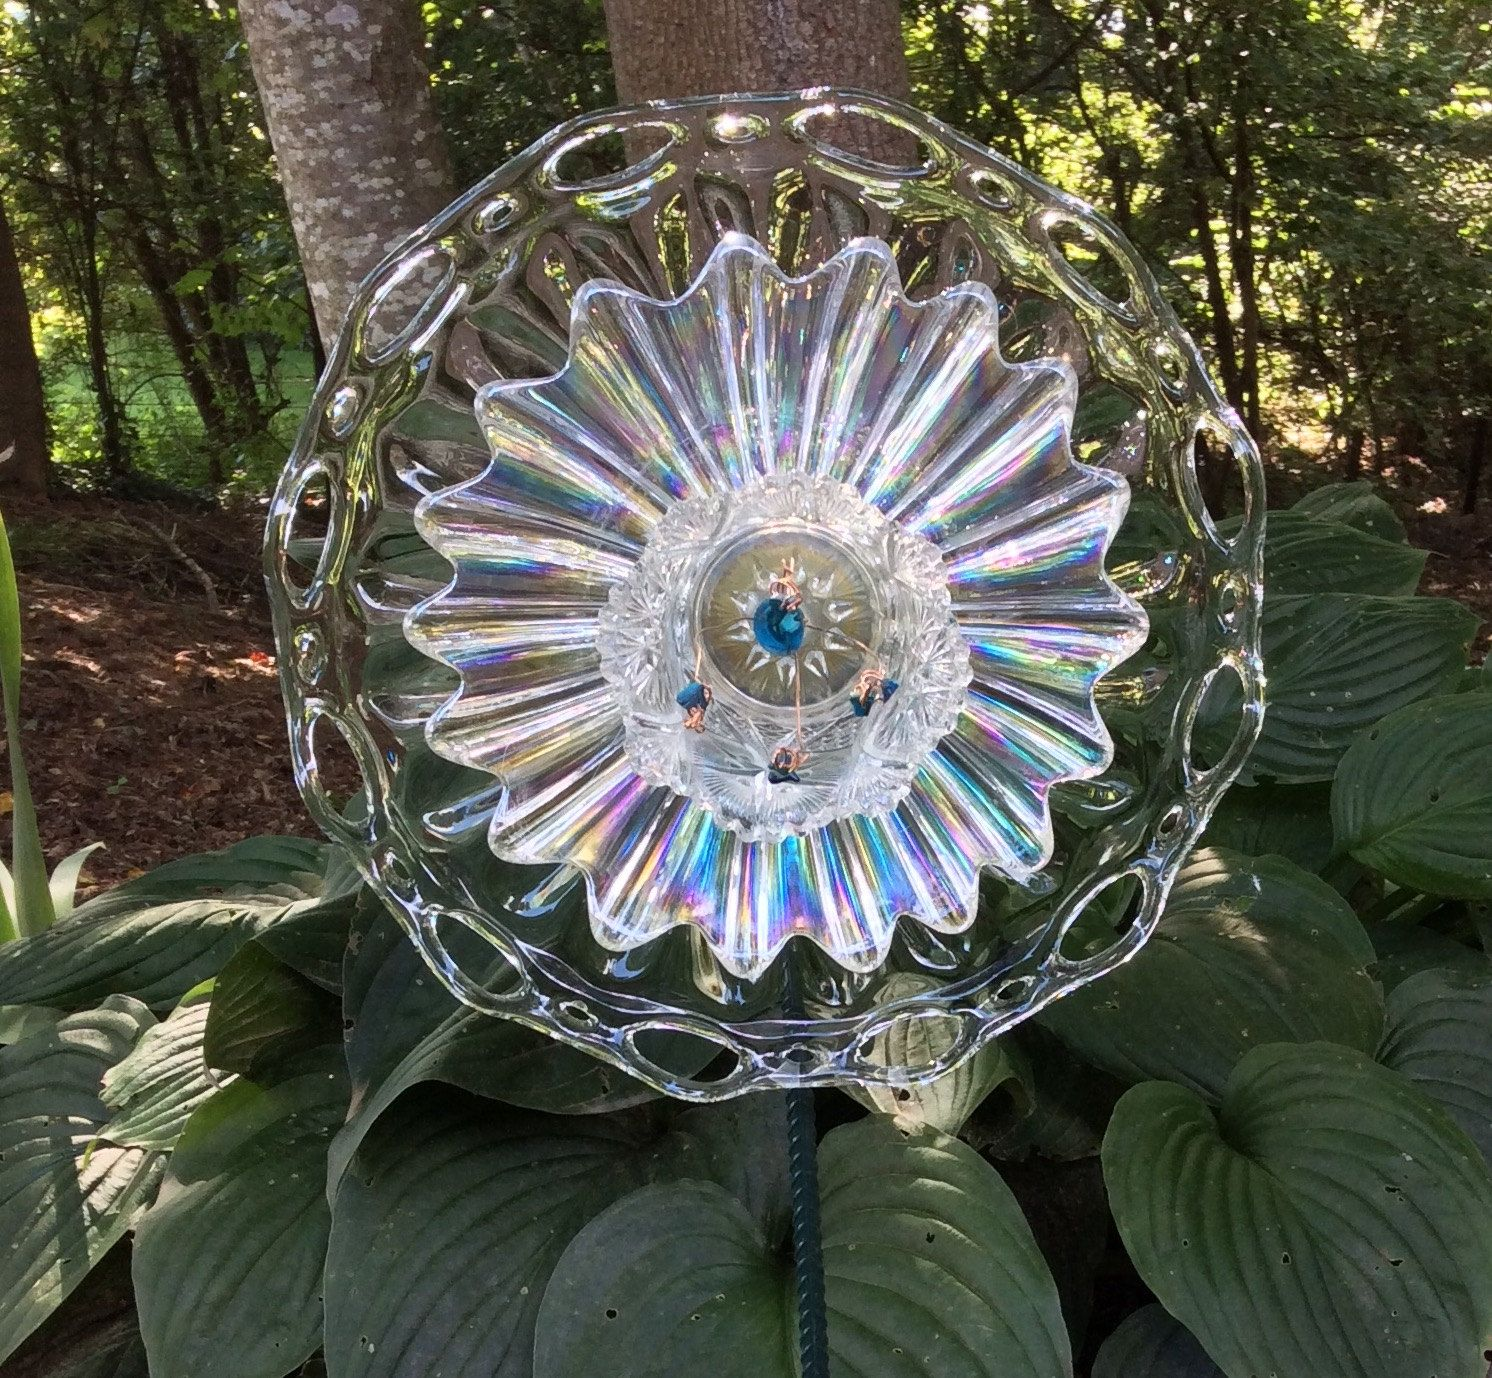 Glass yard art  Glass Flower Ripple and Shine Garden Art Vintage dishes Up